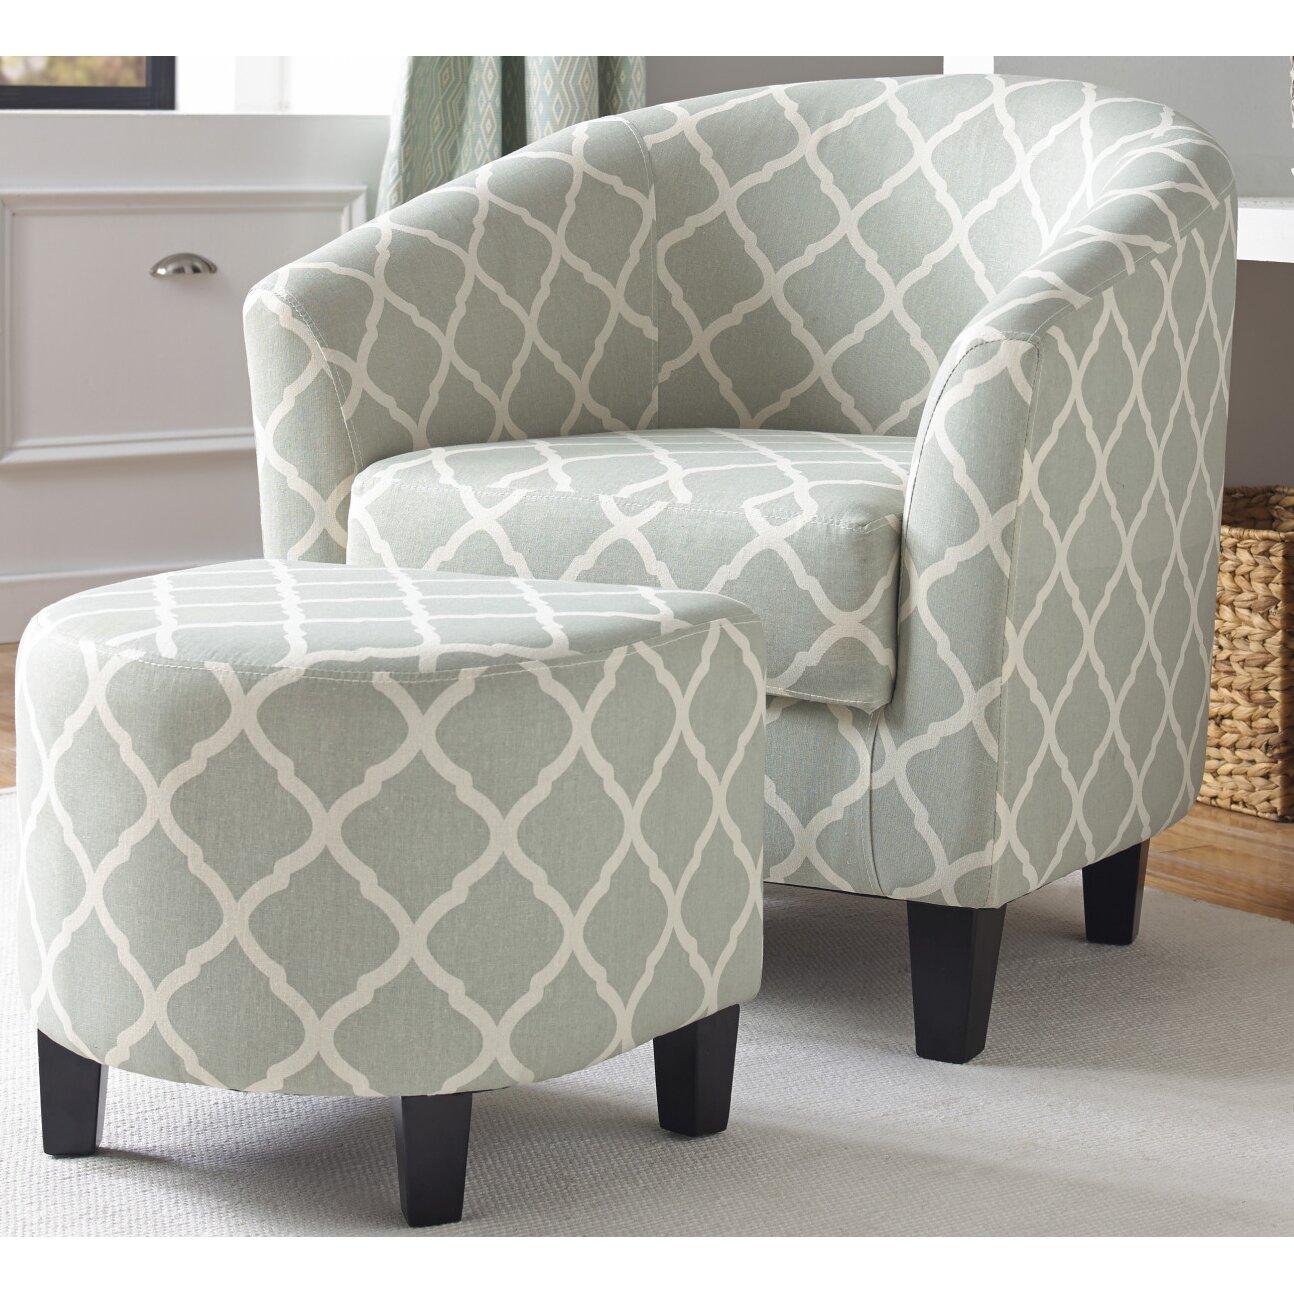 Brayden Studio Upholstered Barrel Chair And Ottoman Set